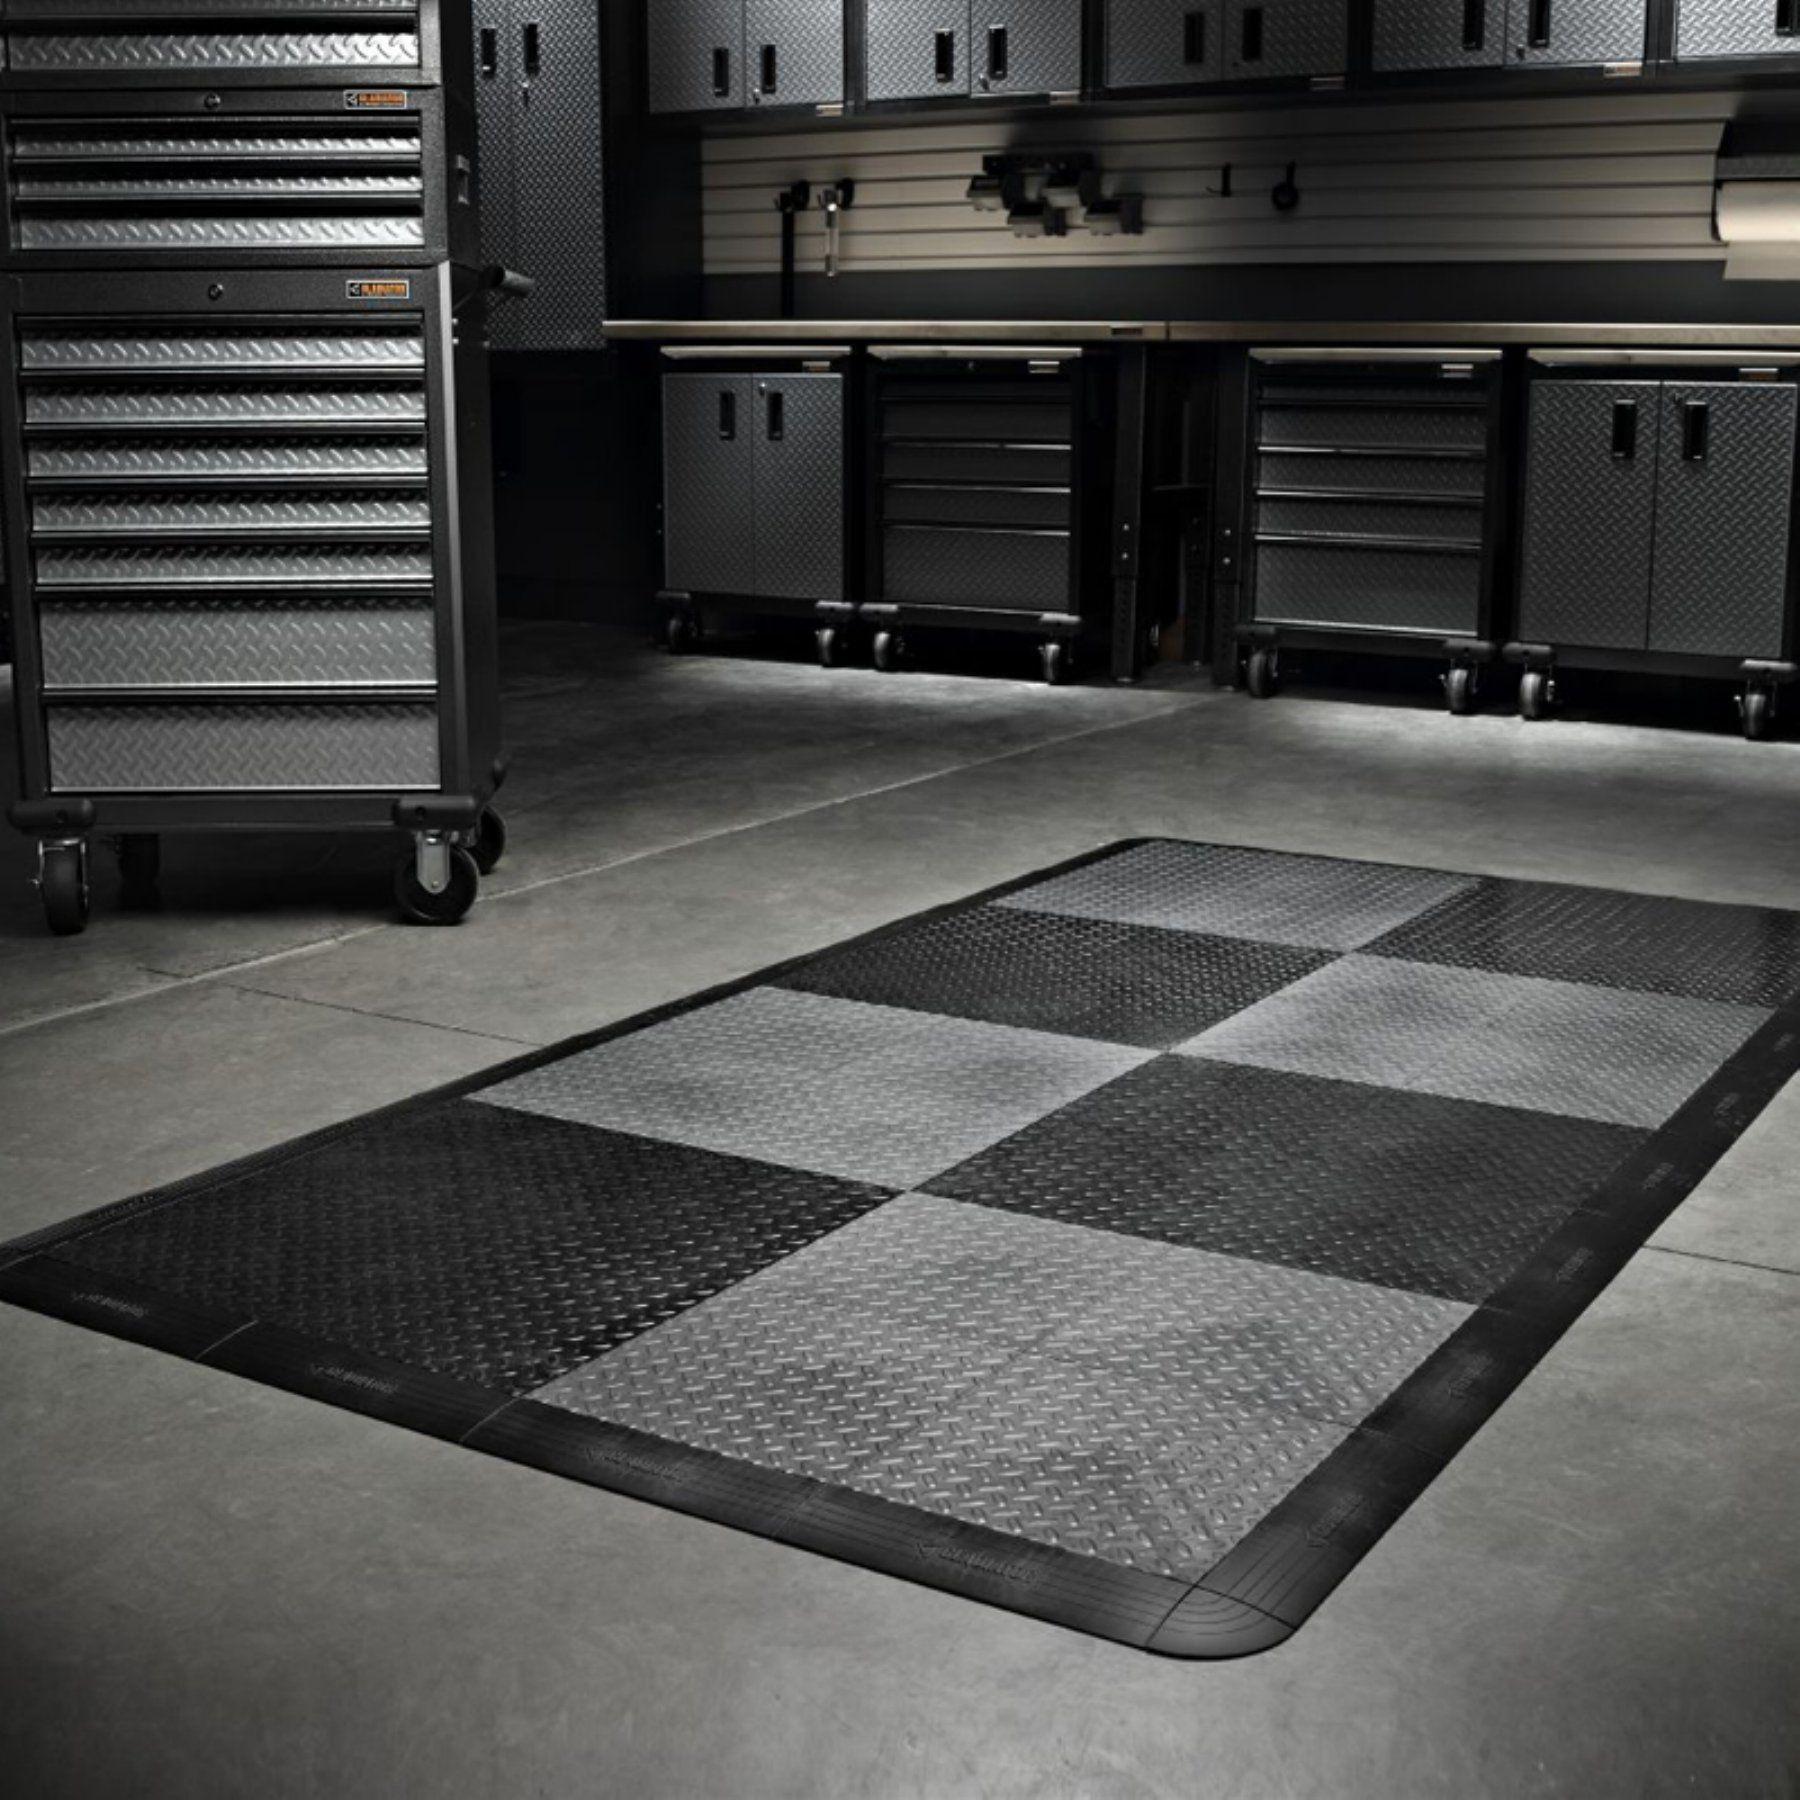 Gladiator Garage Floor Pack Gafp32cbzm Gladiator Garage And Products